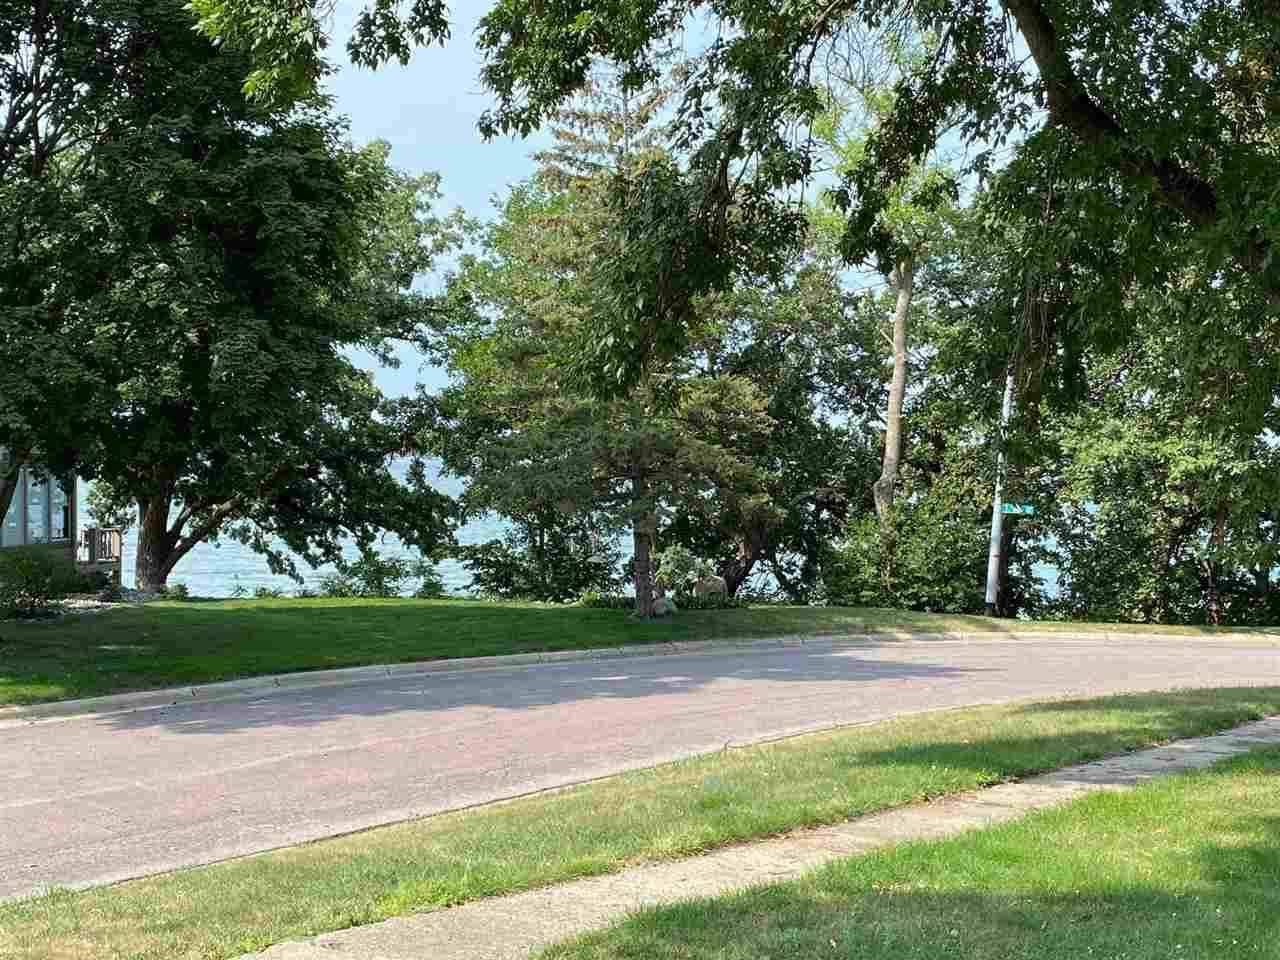 206 Chestnut, Lake Park, IA 51347